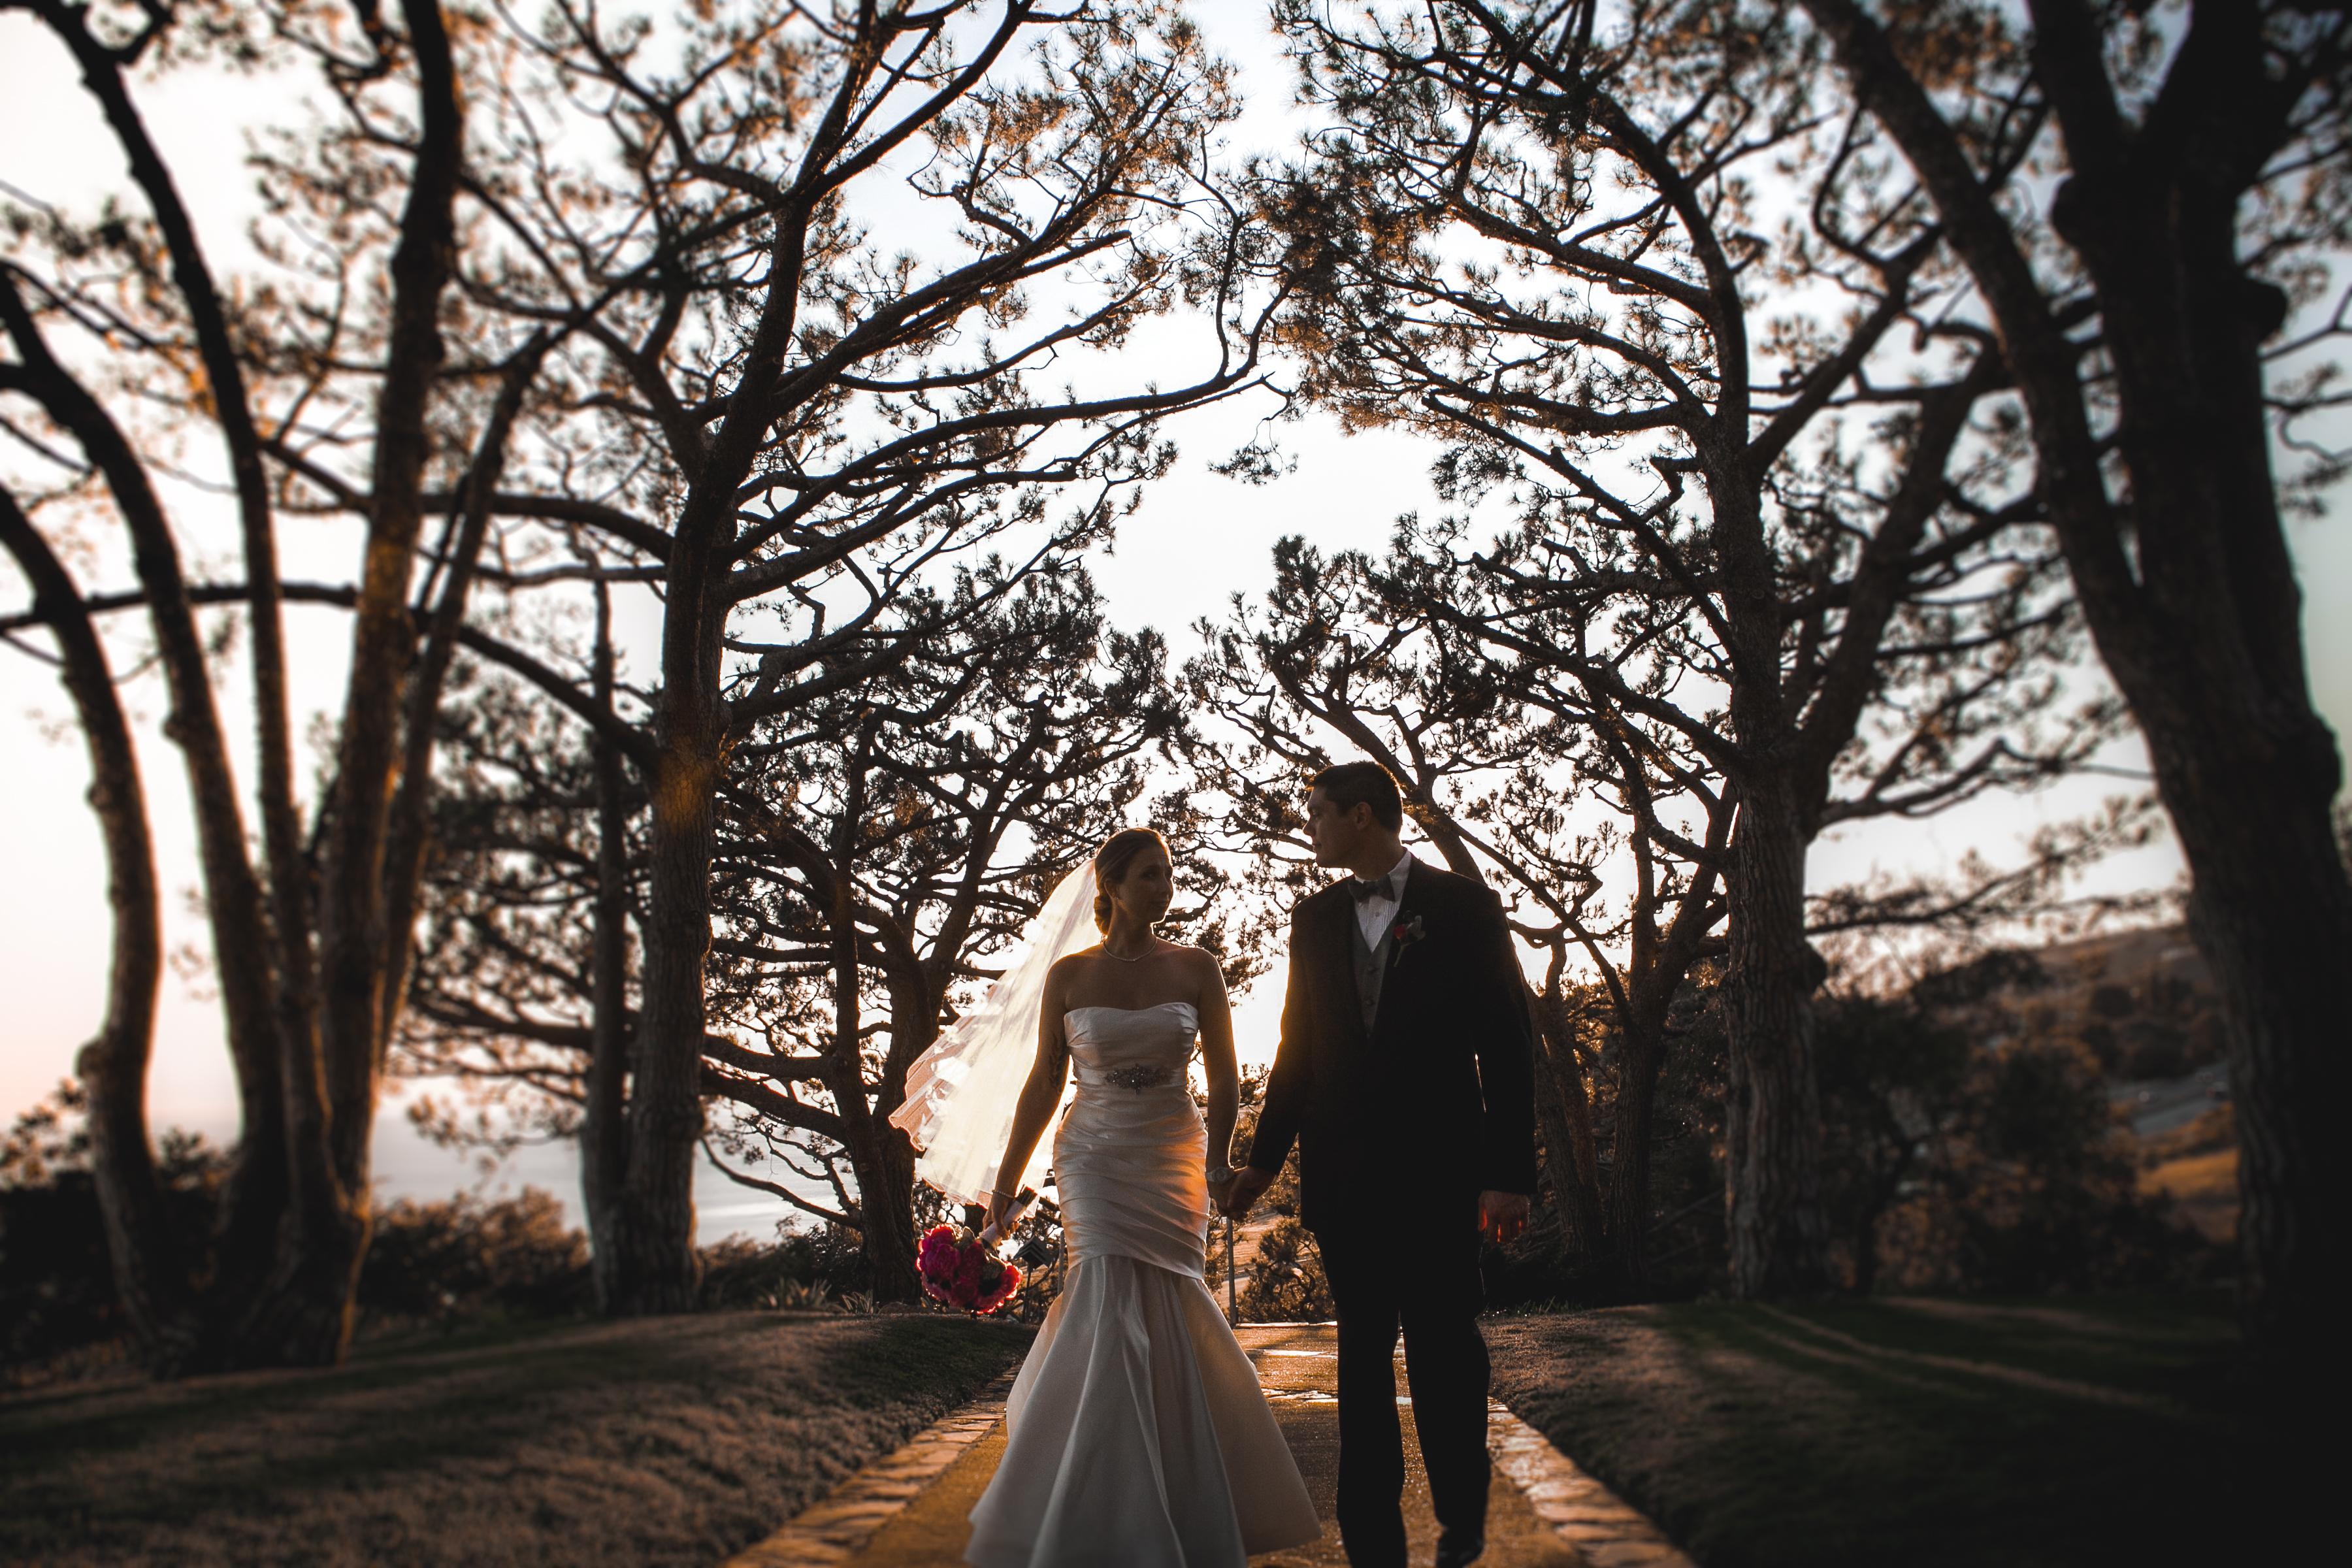 https://sleeklens.com/wp-content/uploads/2018/09/wedding-lightroom-presets-signature-bride-groom-after-13.jpg